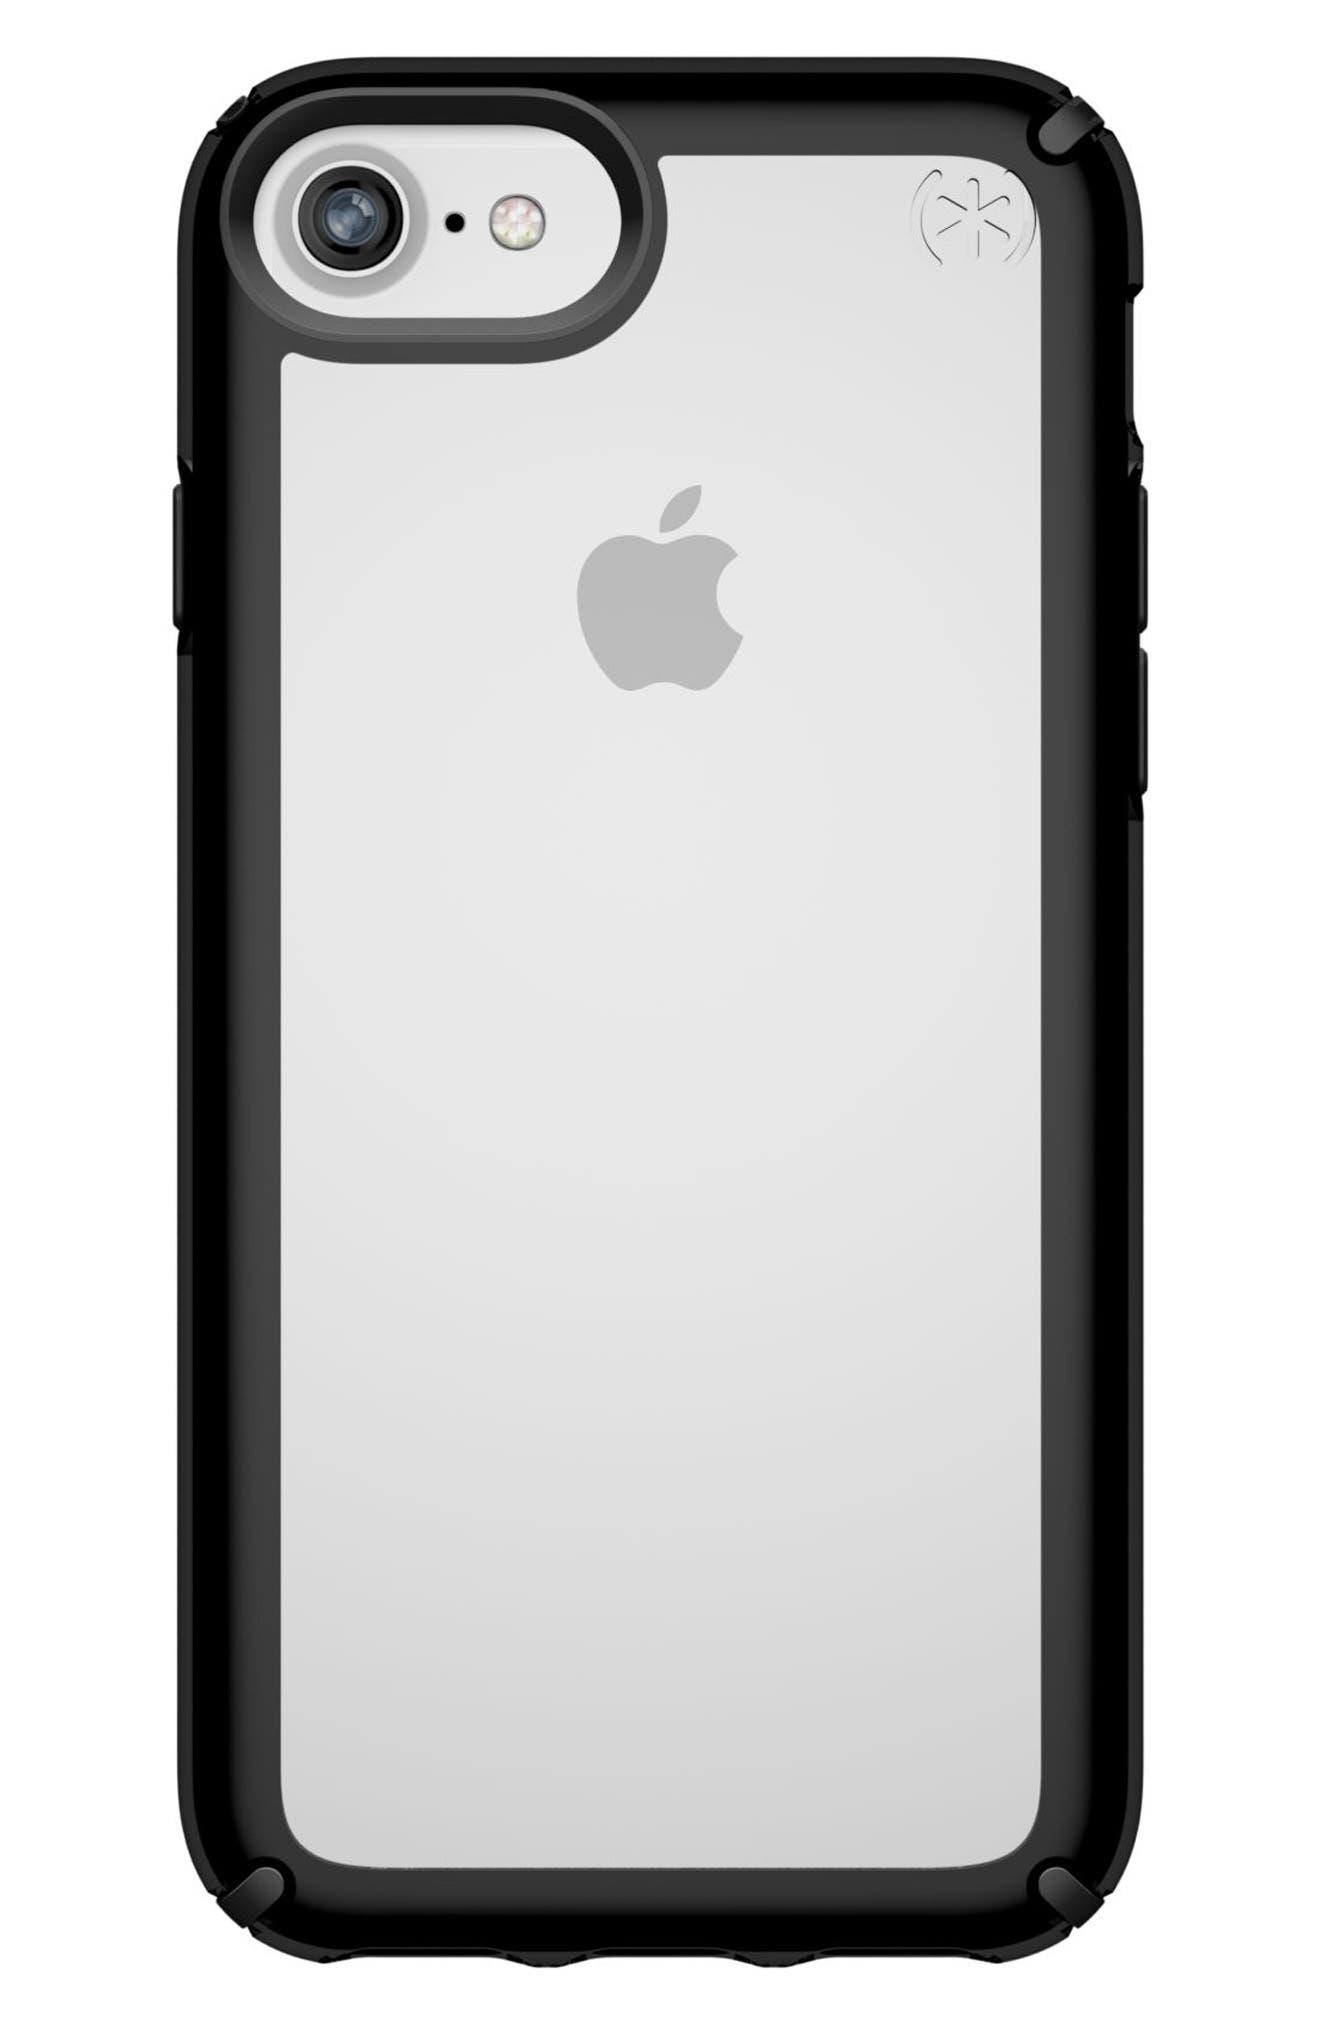 Speck Transparent iPhone 6/6s/7/8 Case